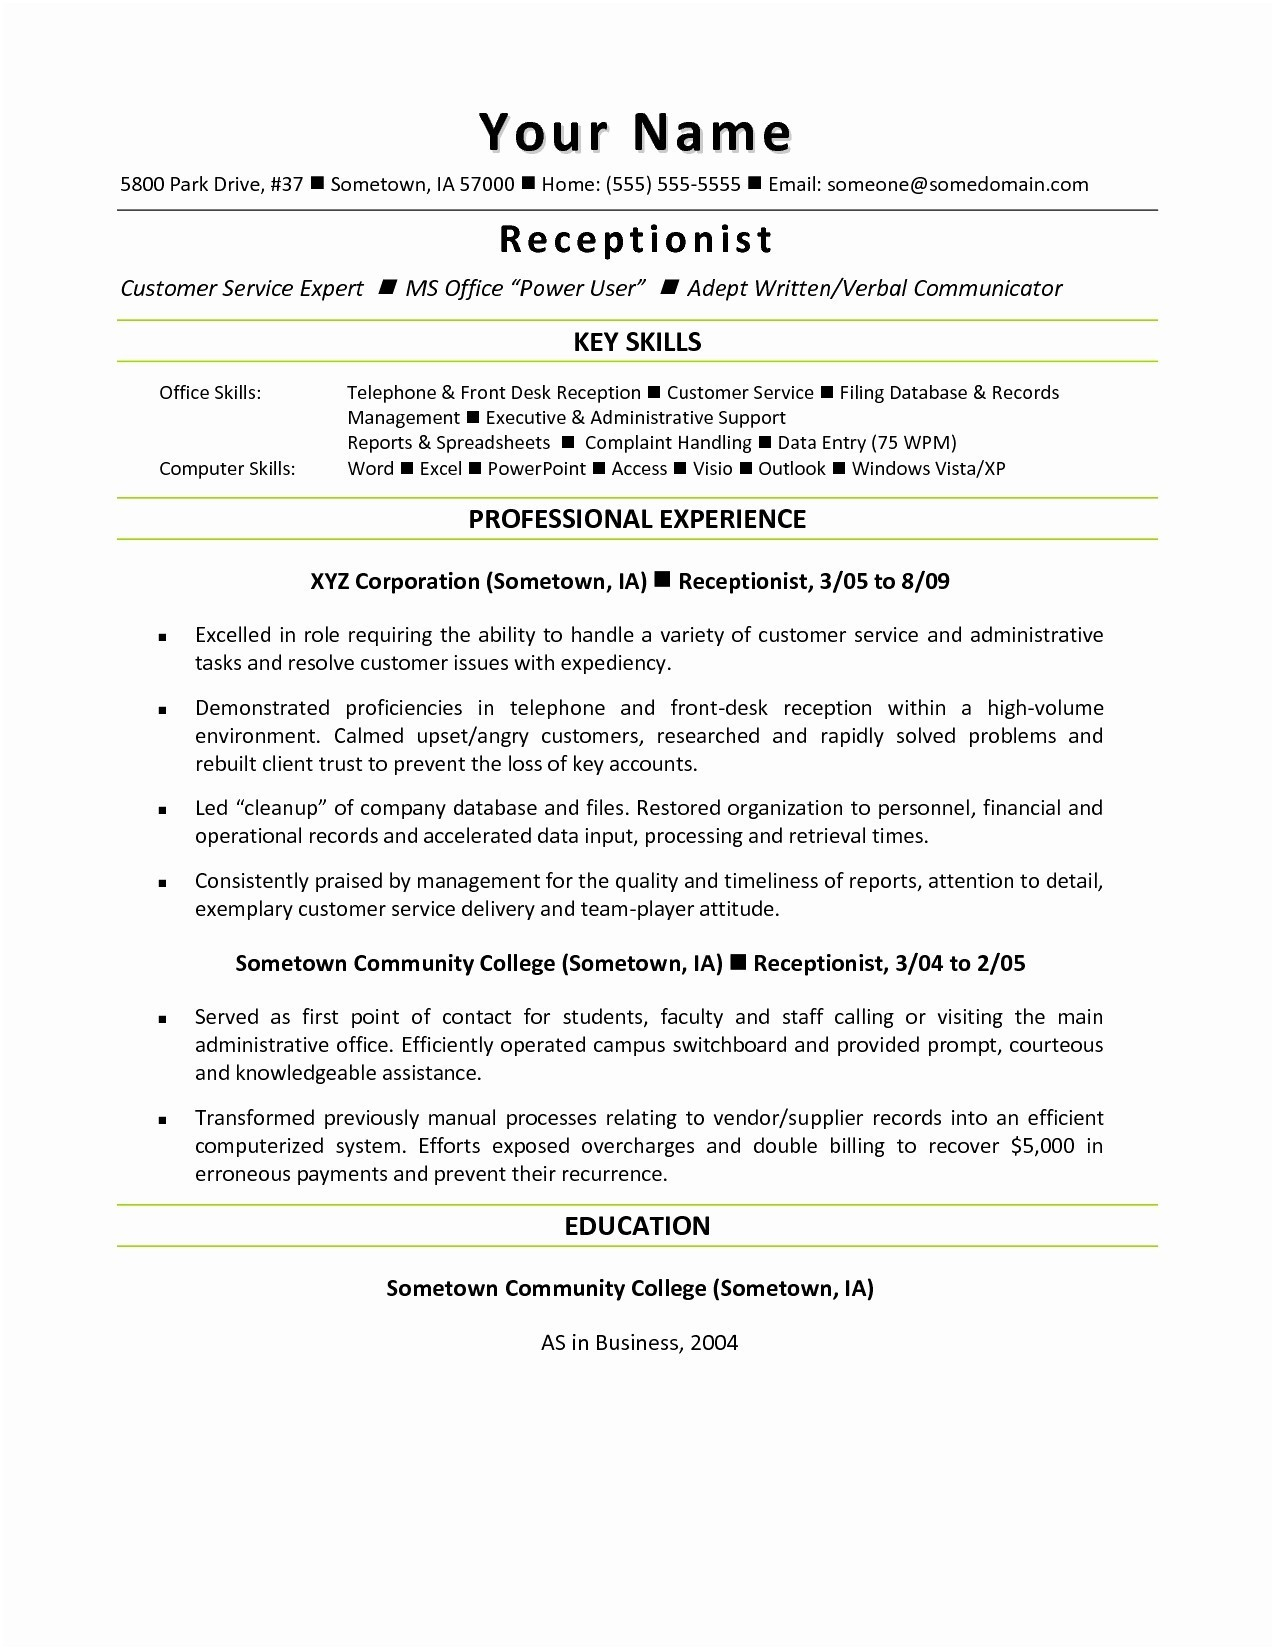 Sample Cover Letter Template Word - Resume Microsoft Word Fresh Resume Mail format Sample Fresh